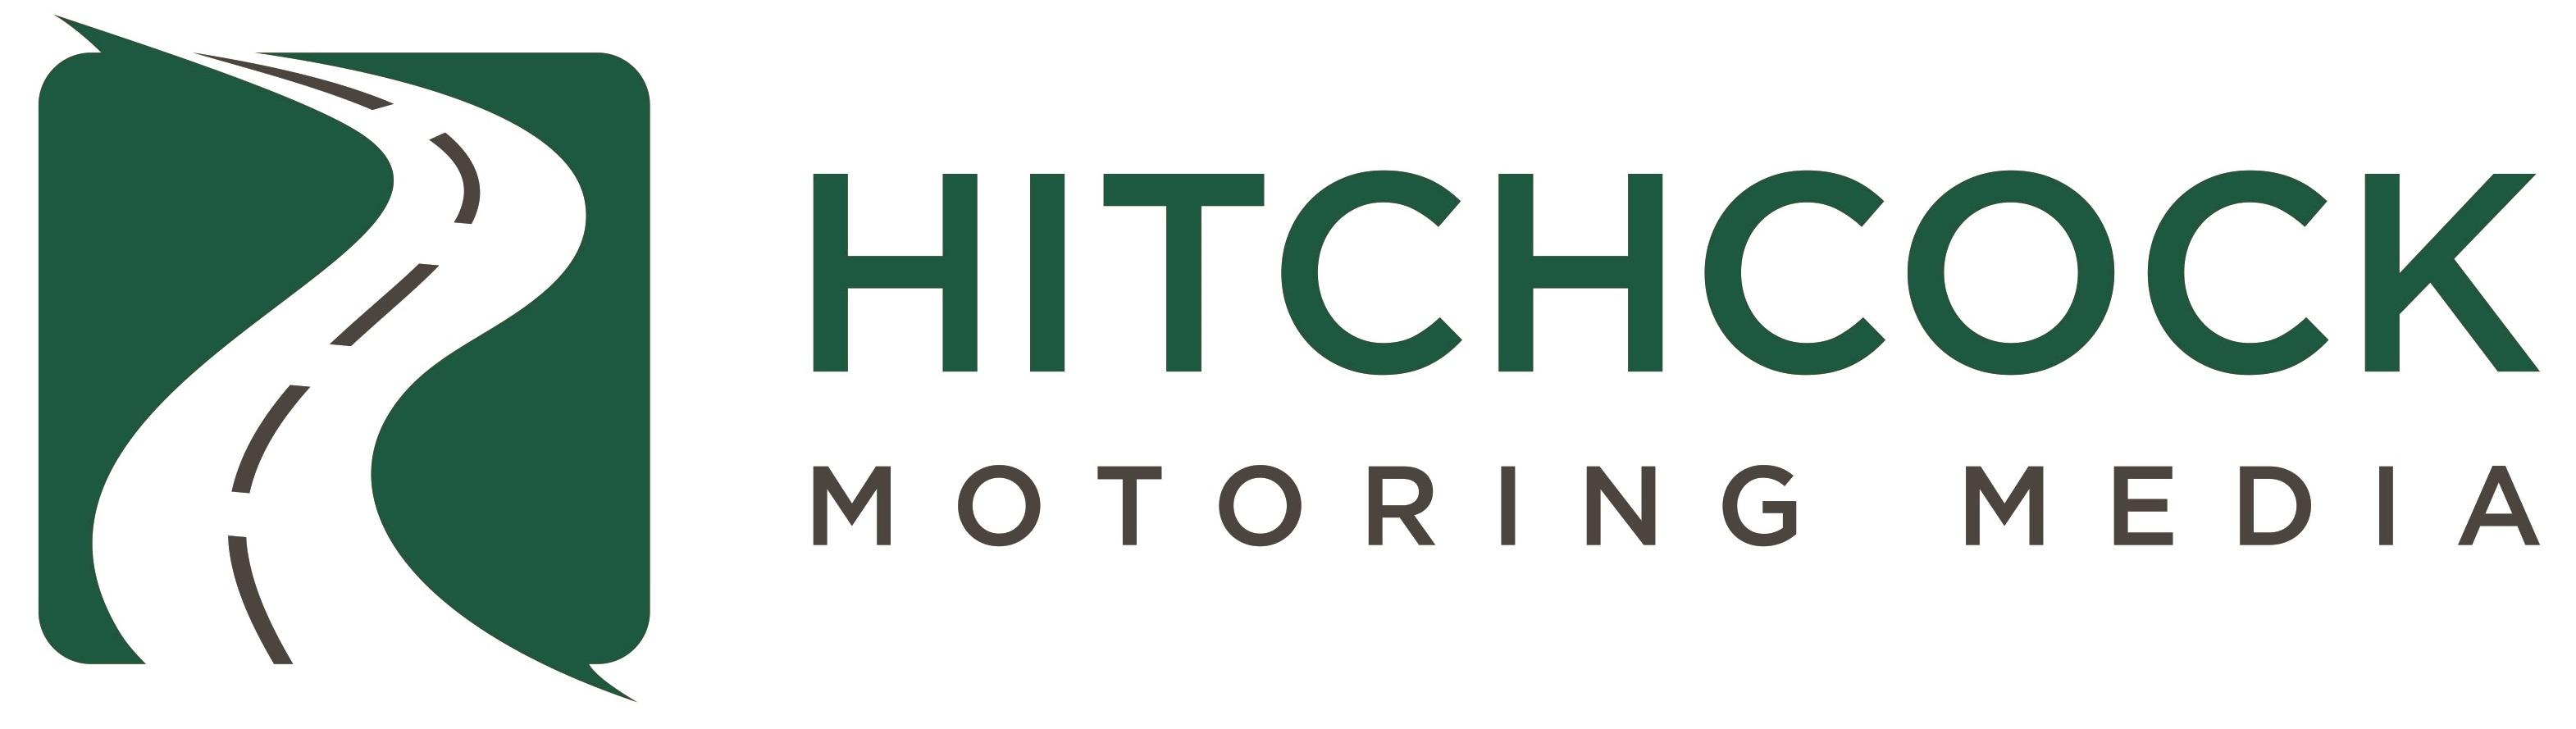 Hitchcock Motoring Media